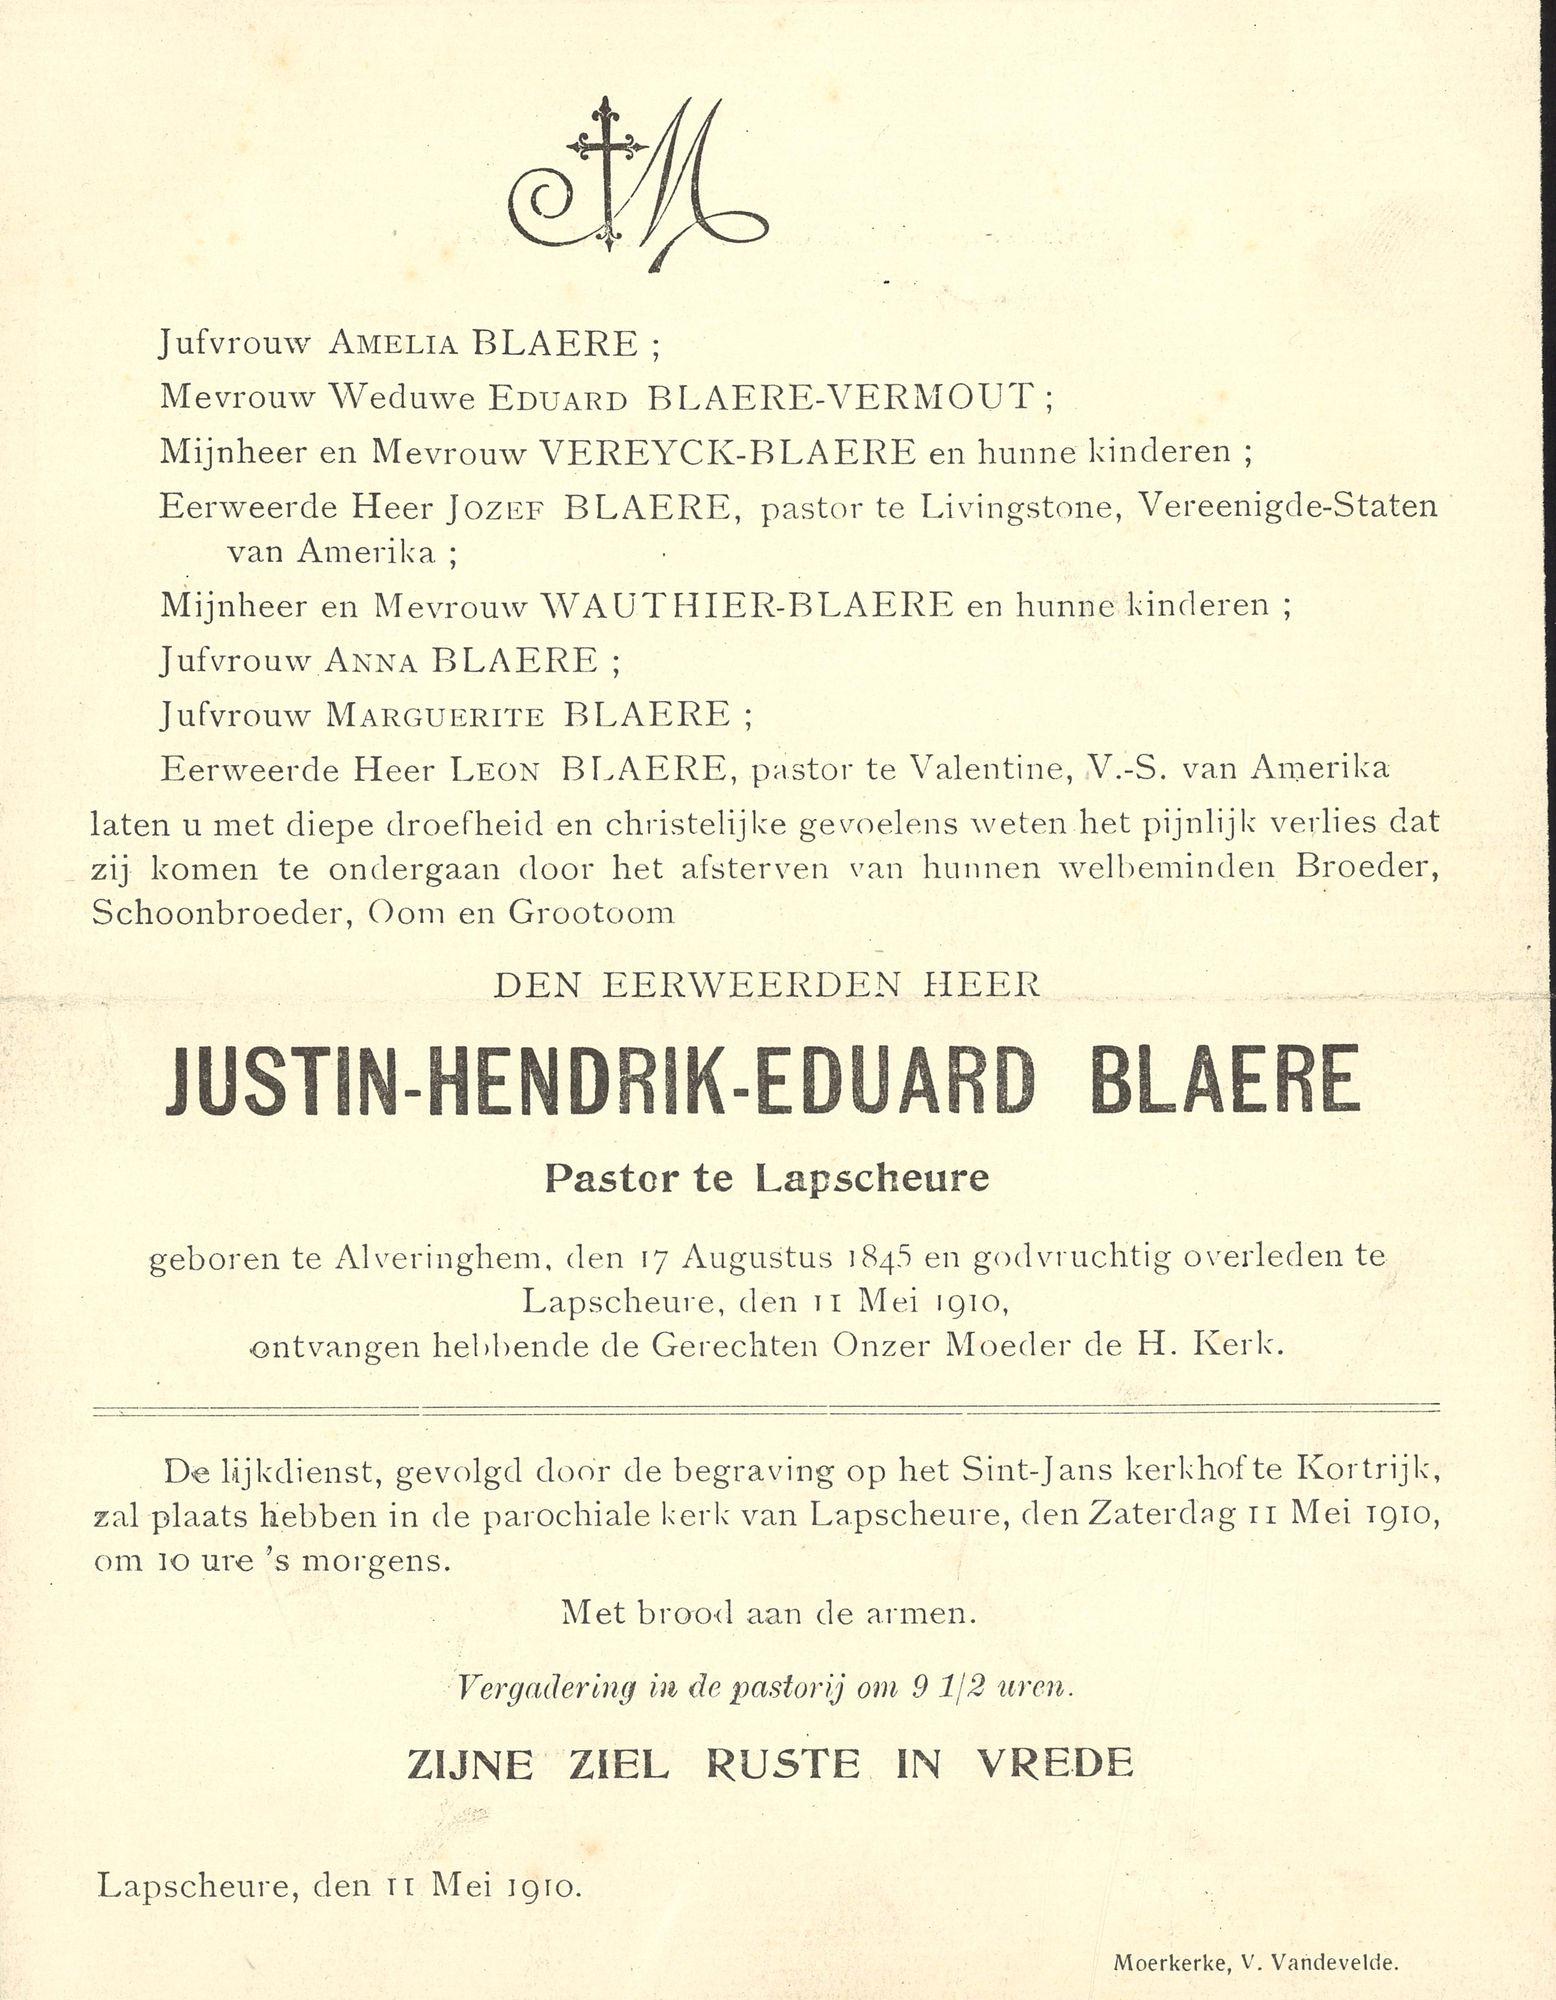 Justin-Hendrik-Eduard Blaere